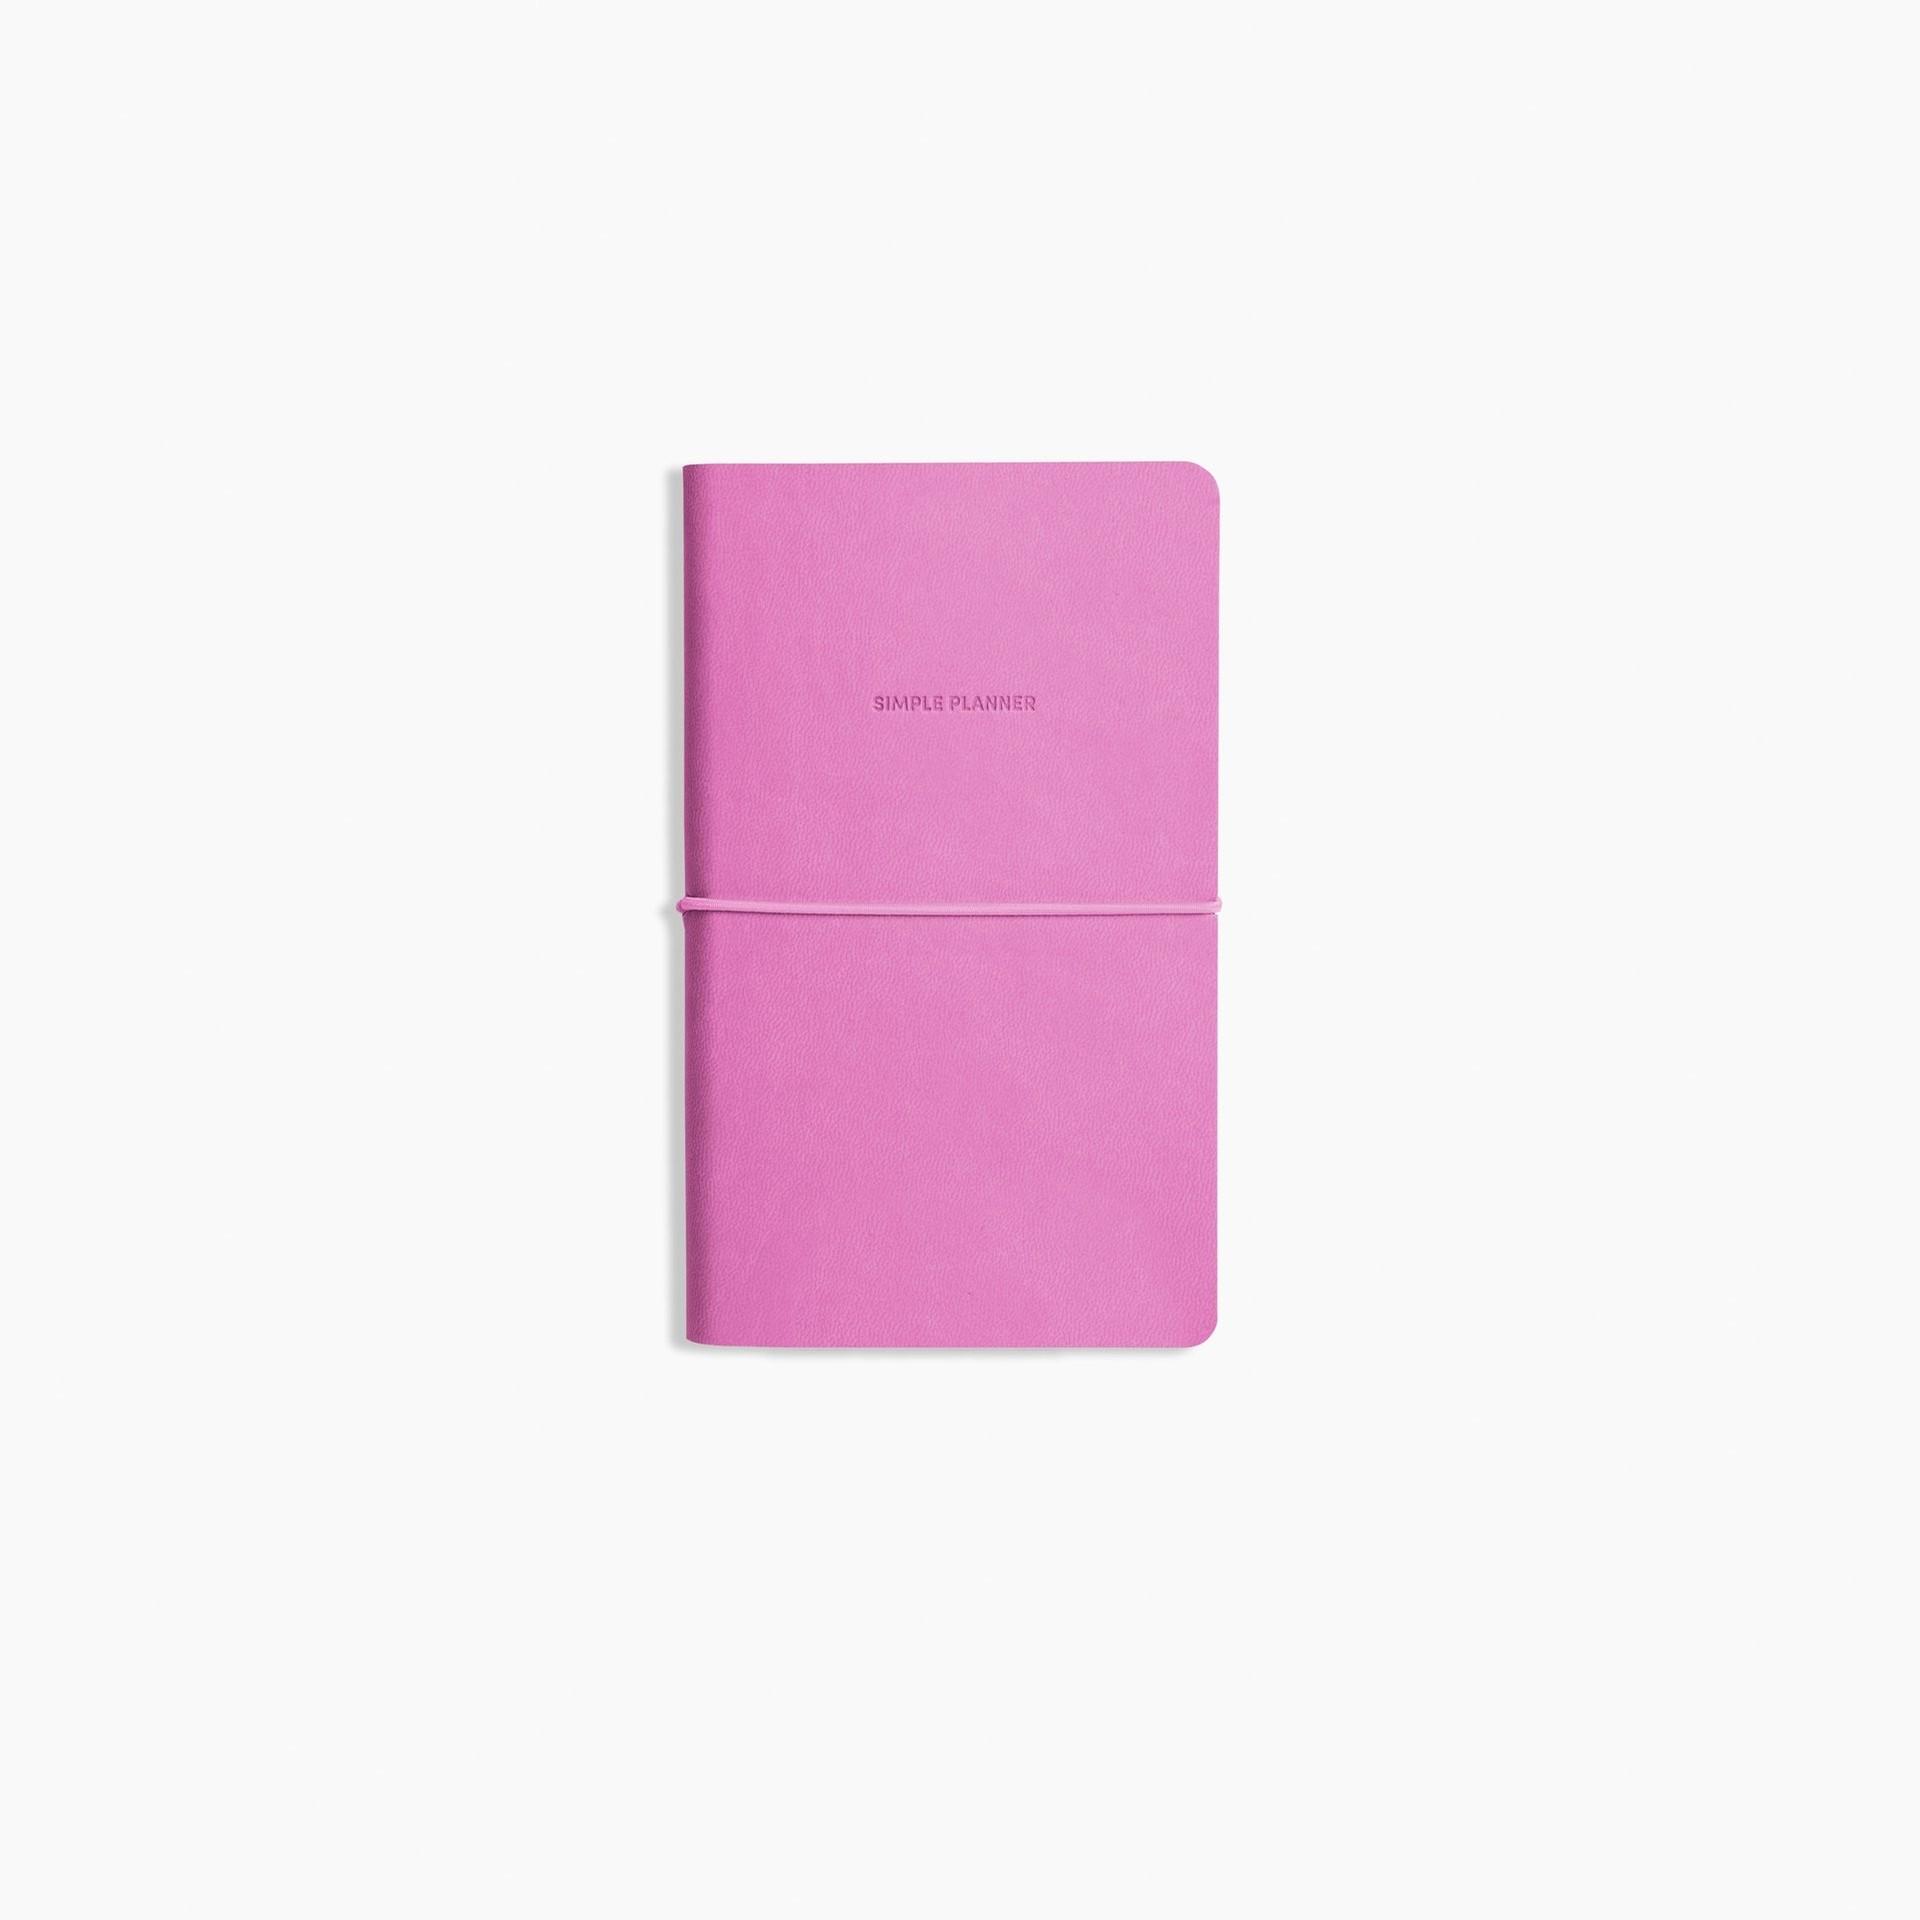 Simple Planner: Fuchsia